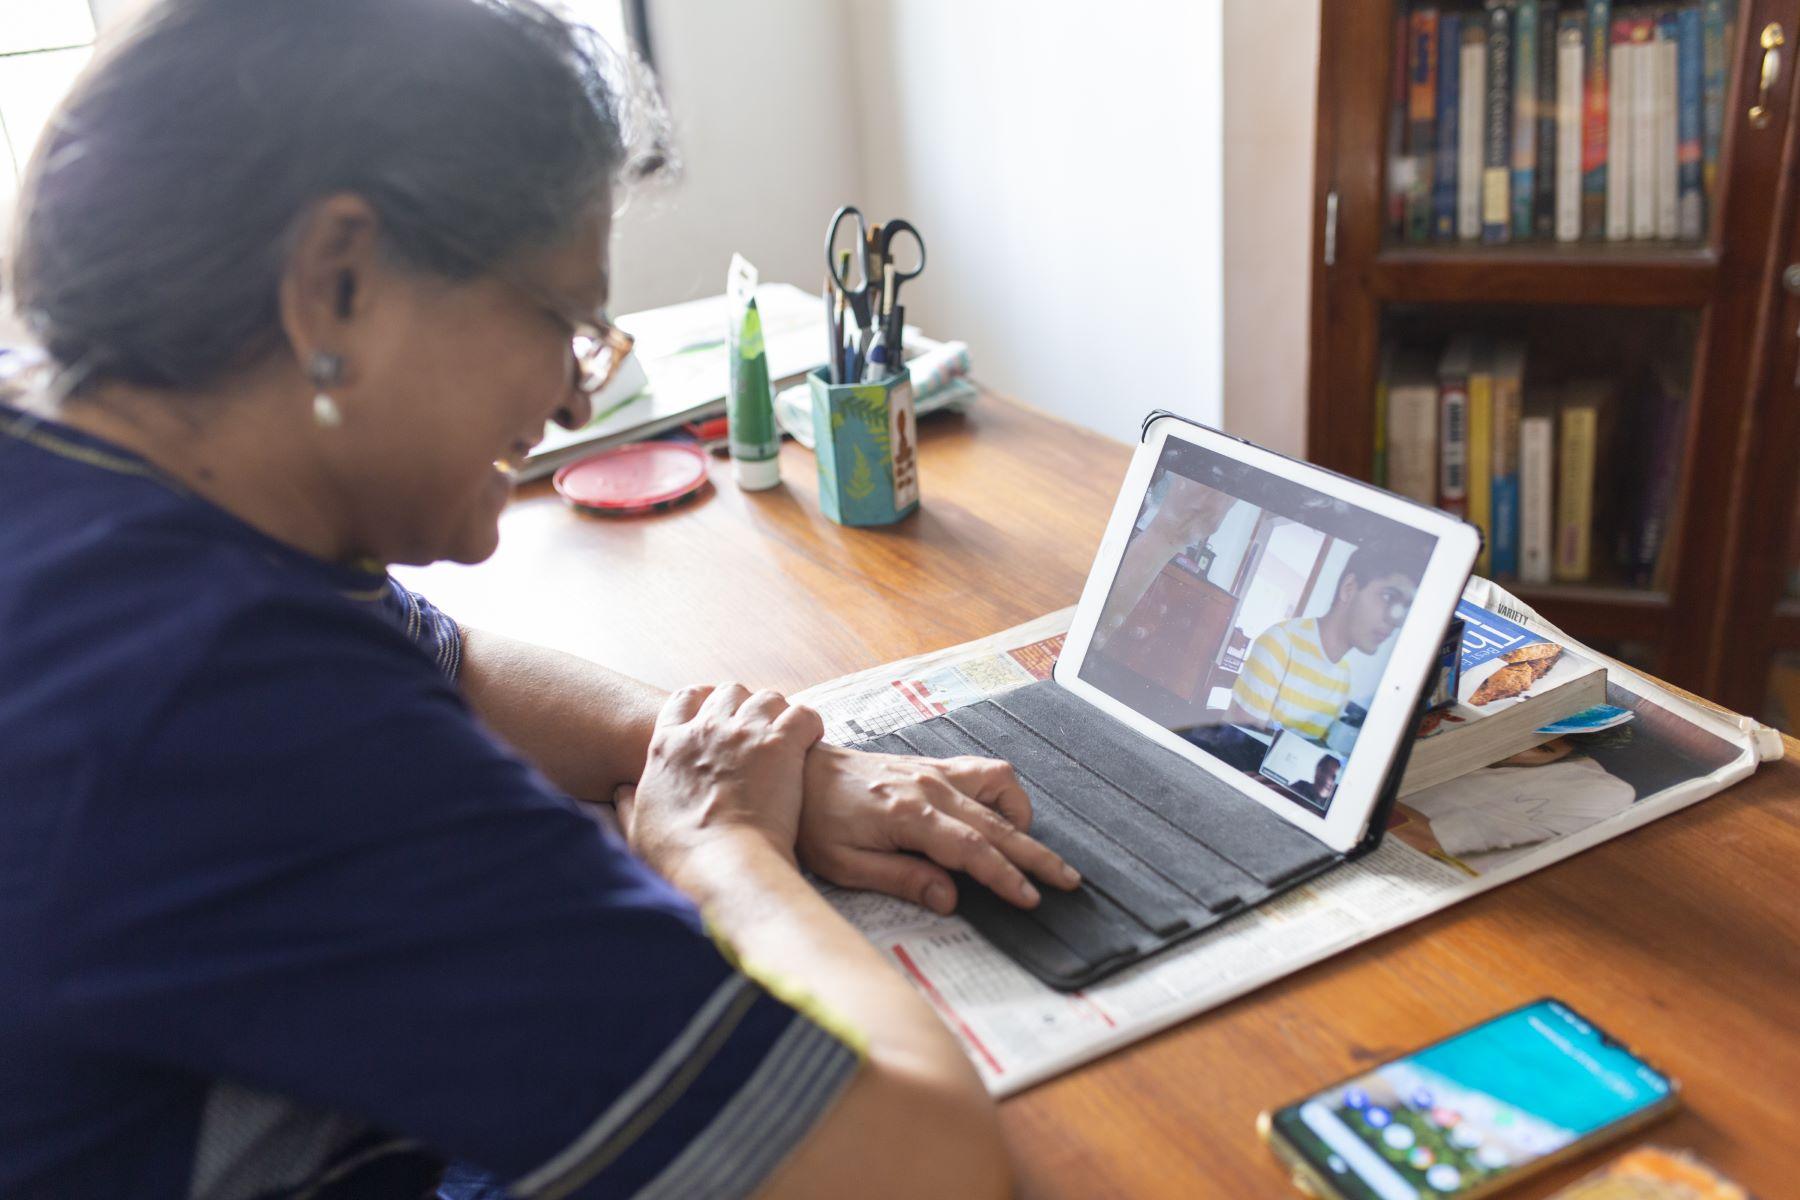 Jyotsna Srinivasan having a fun conversation with Madhav and Madhuca (mother)